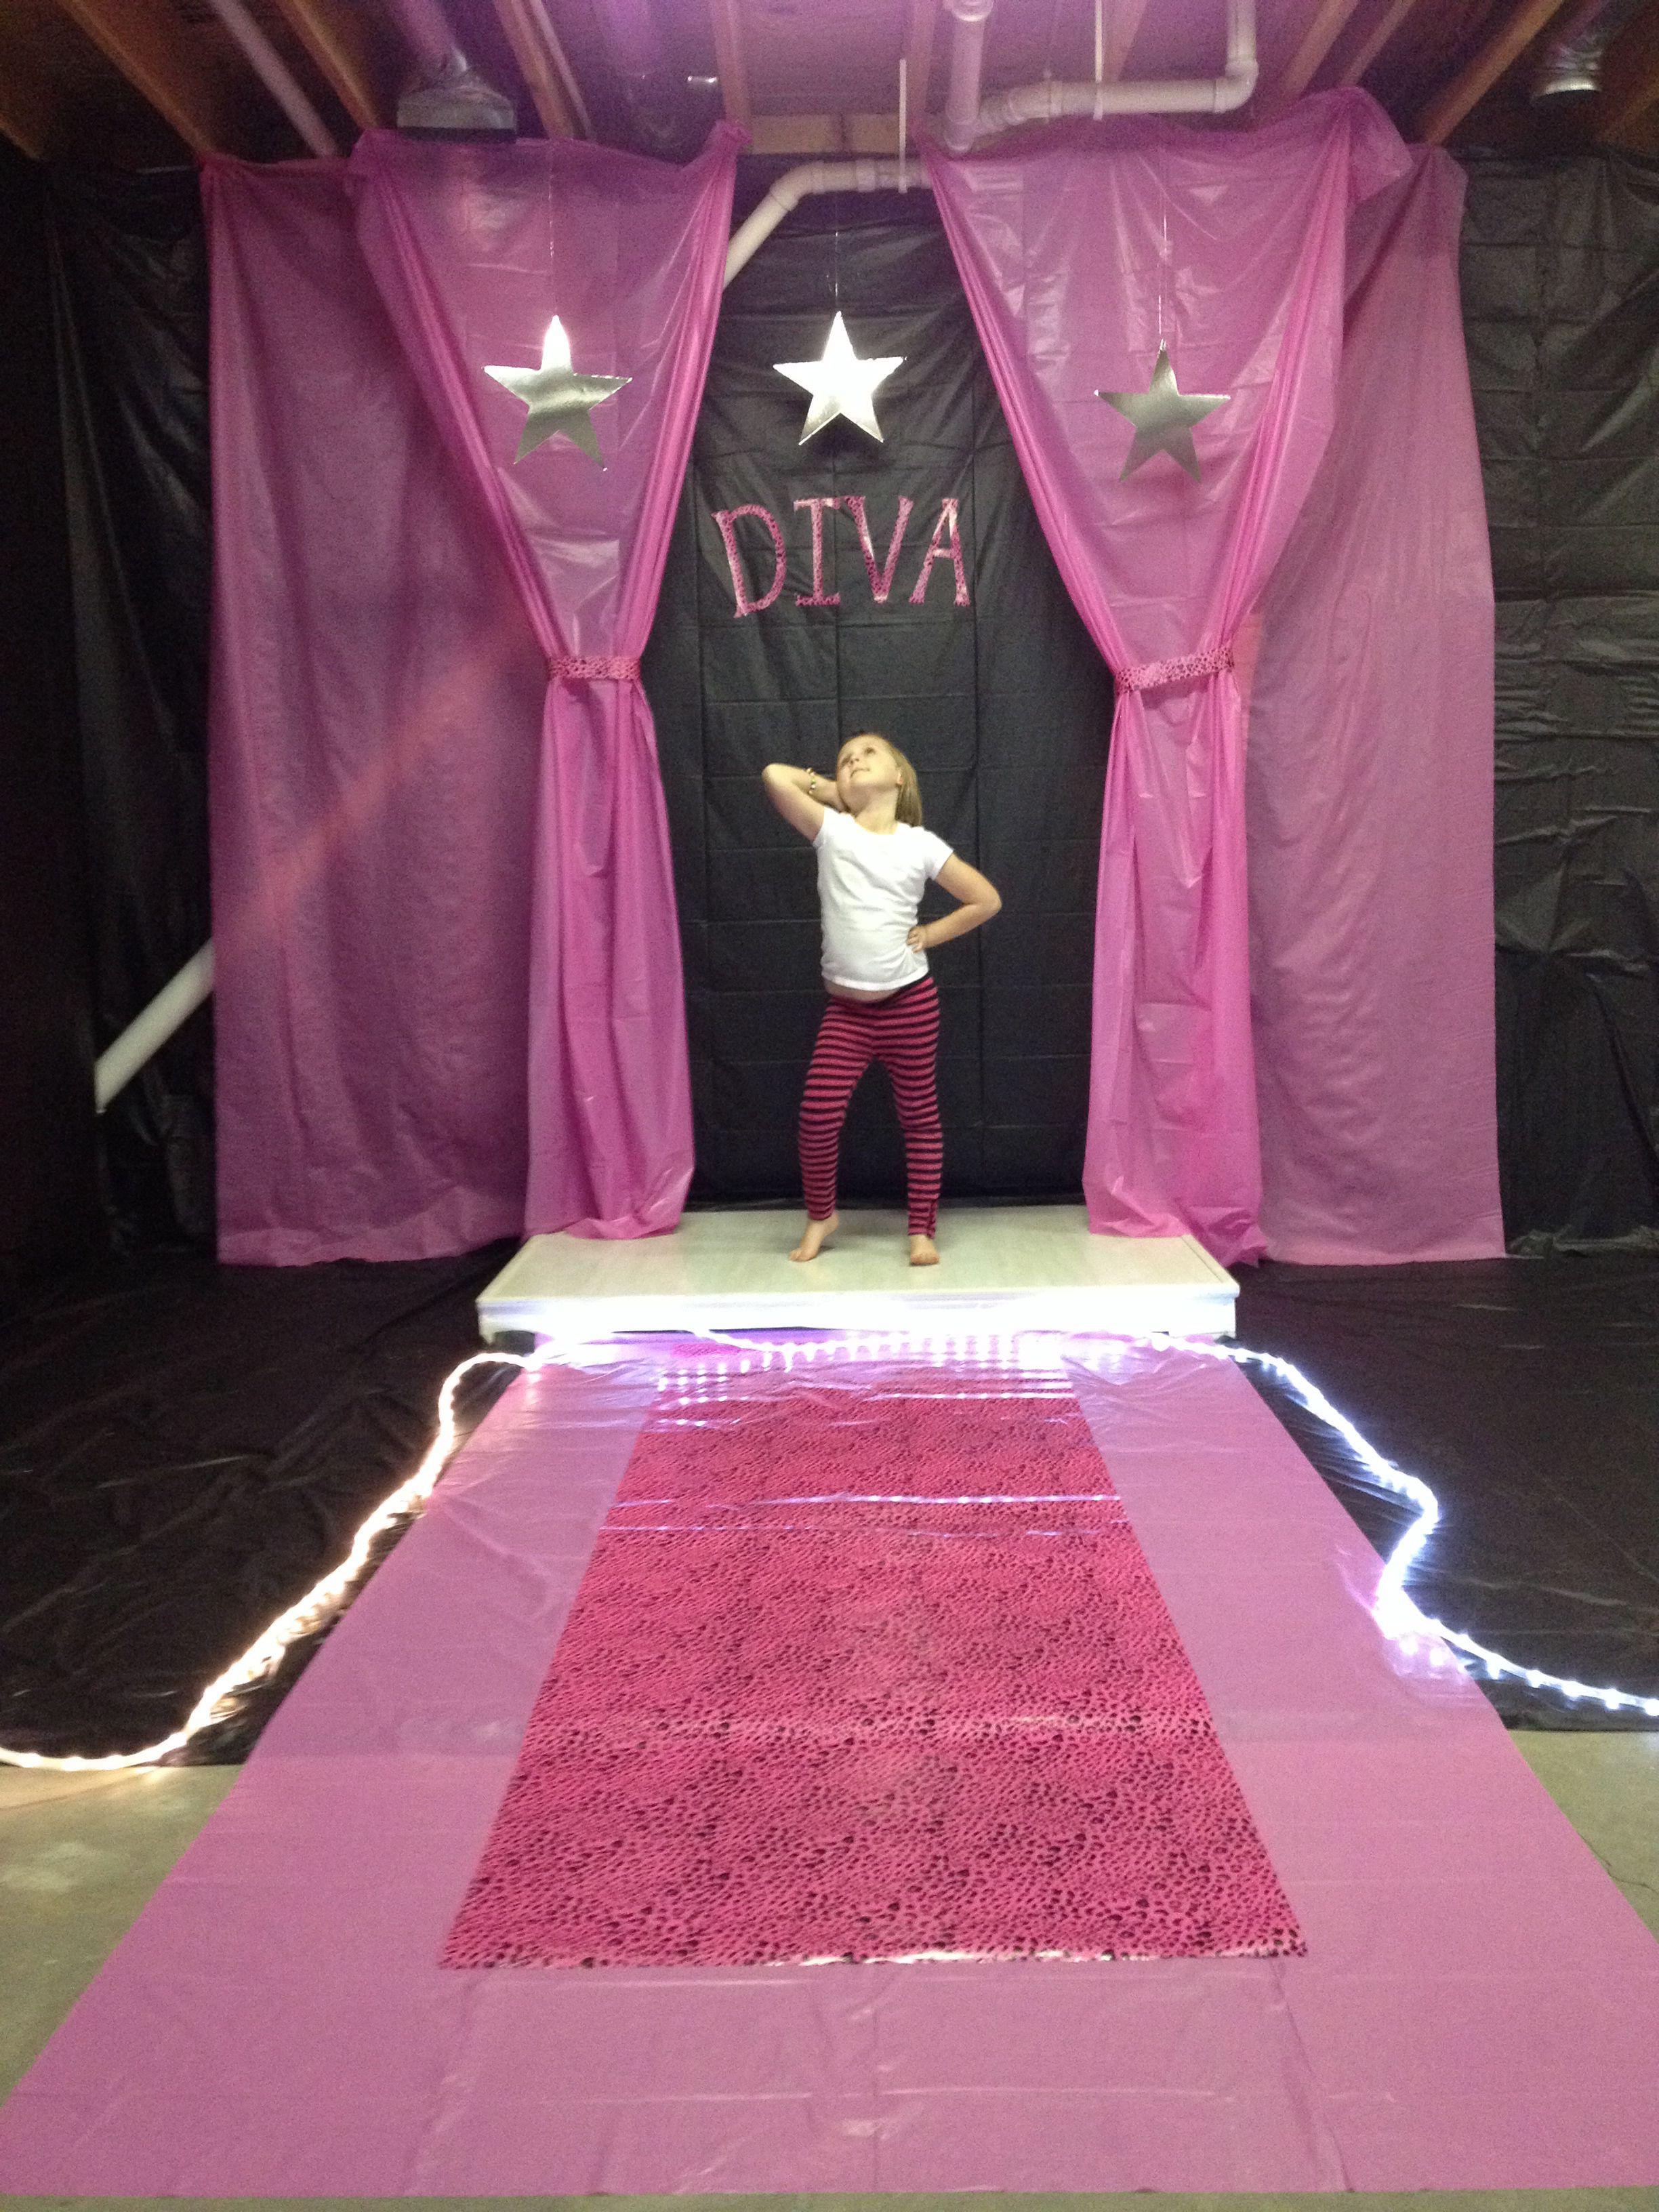 Diva birthday party Madison Pinterest Diva birthday parties